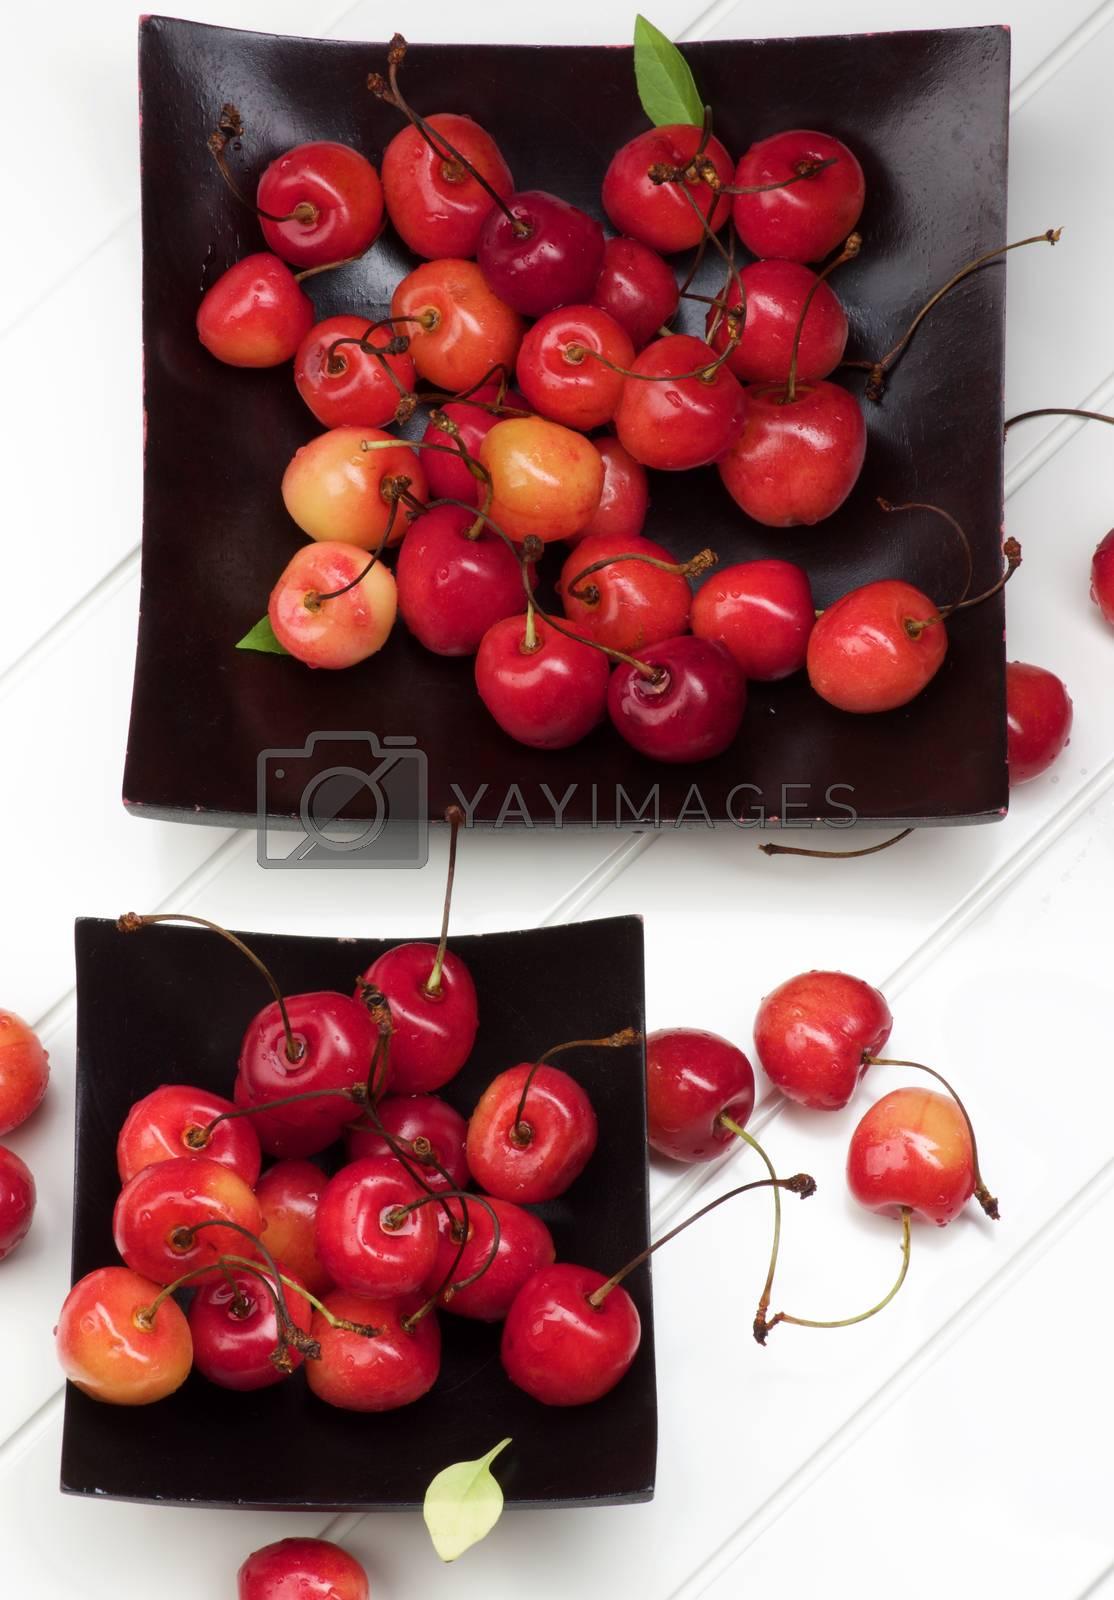 Arrangement of Two Black Plates Full of Fresh Ripe Sweet Maraschino Cherries closeup on Plank White background